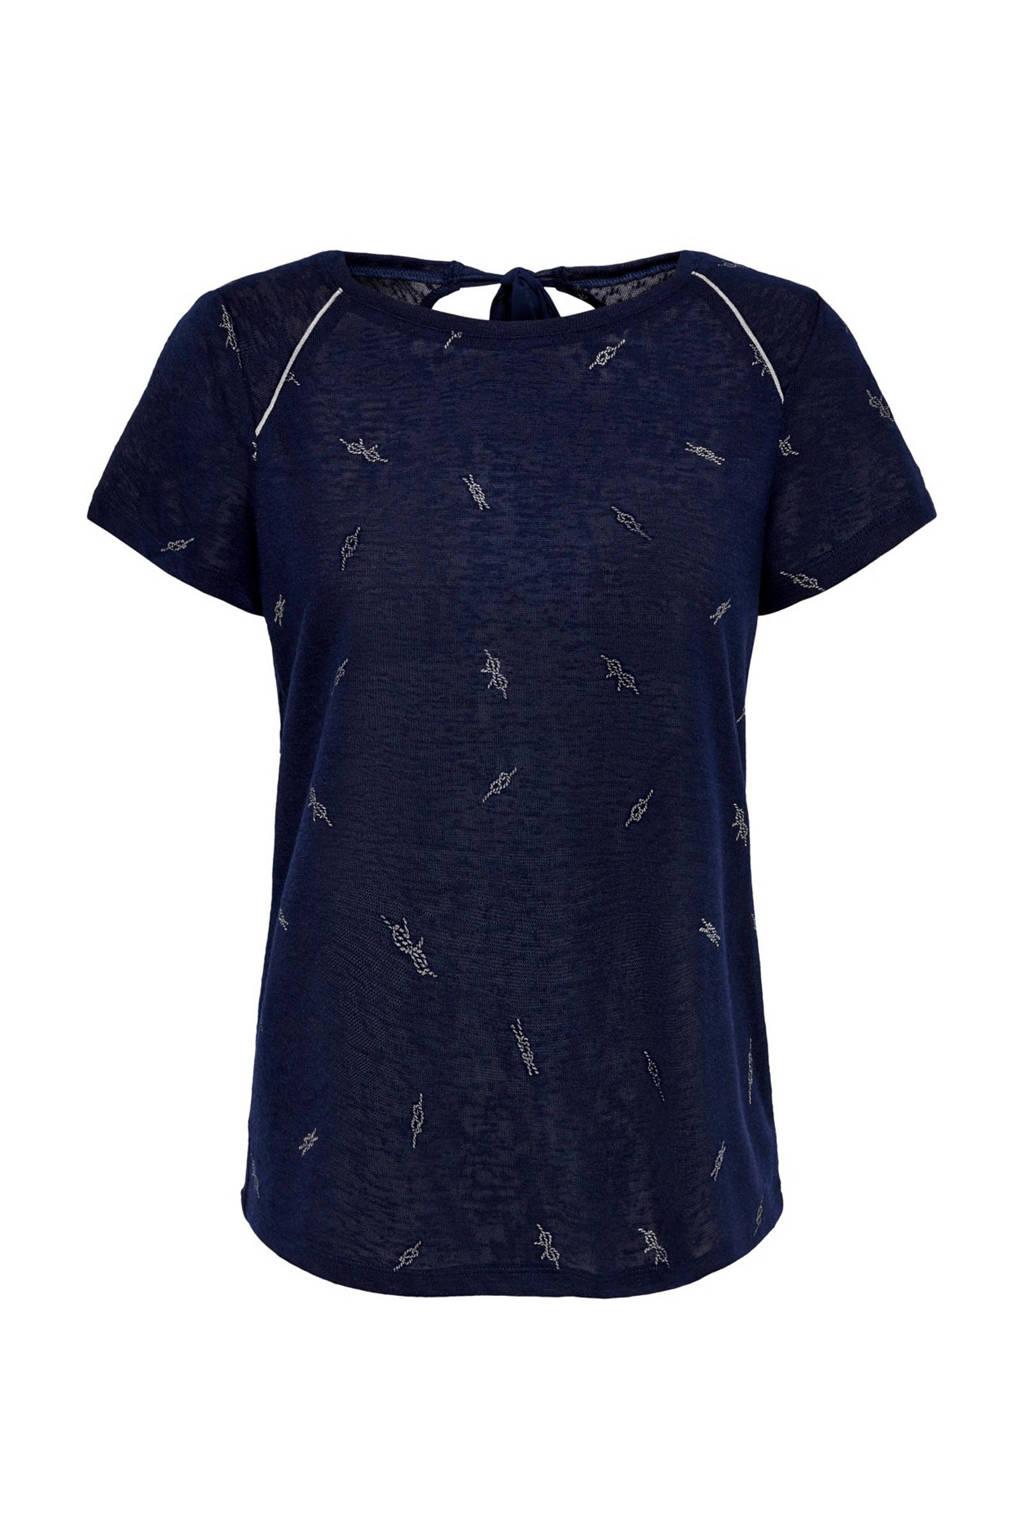 ONLY T-shirt met all over print blauw, Blauw